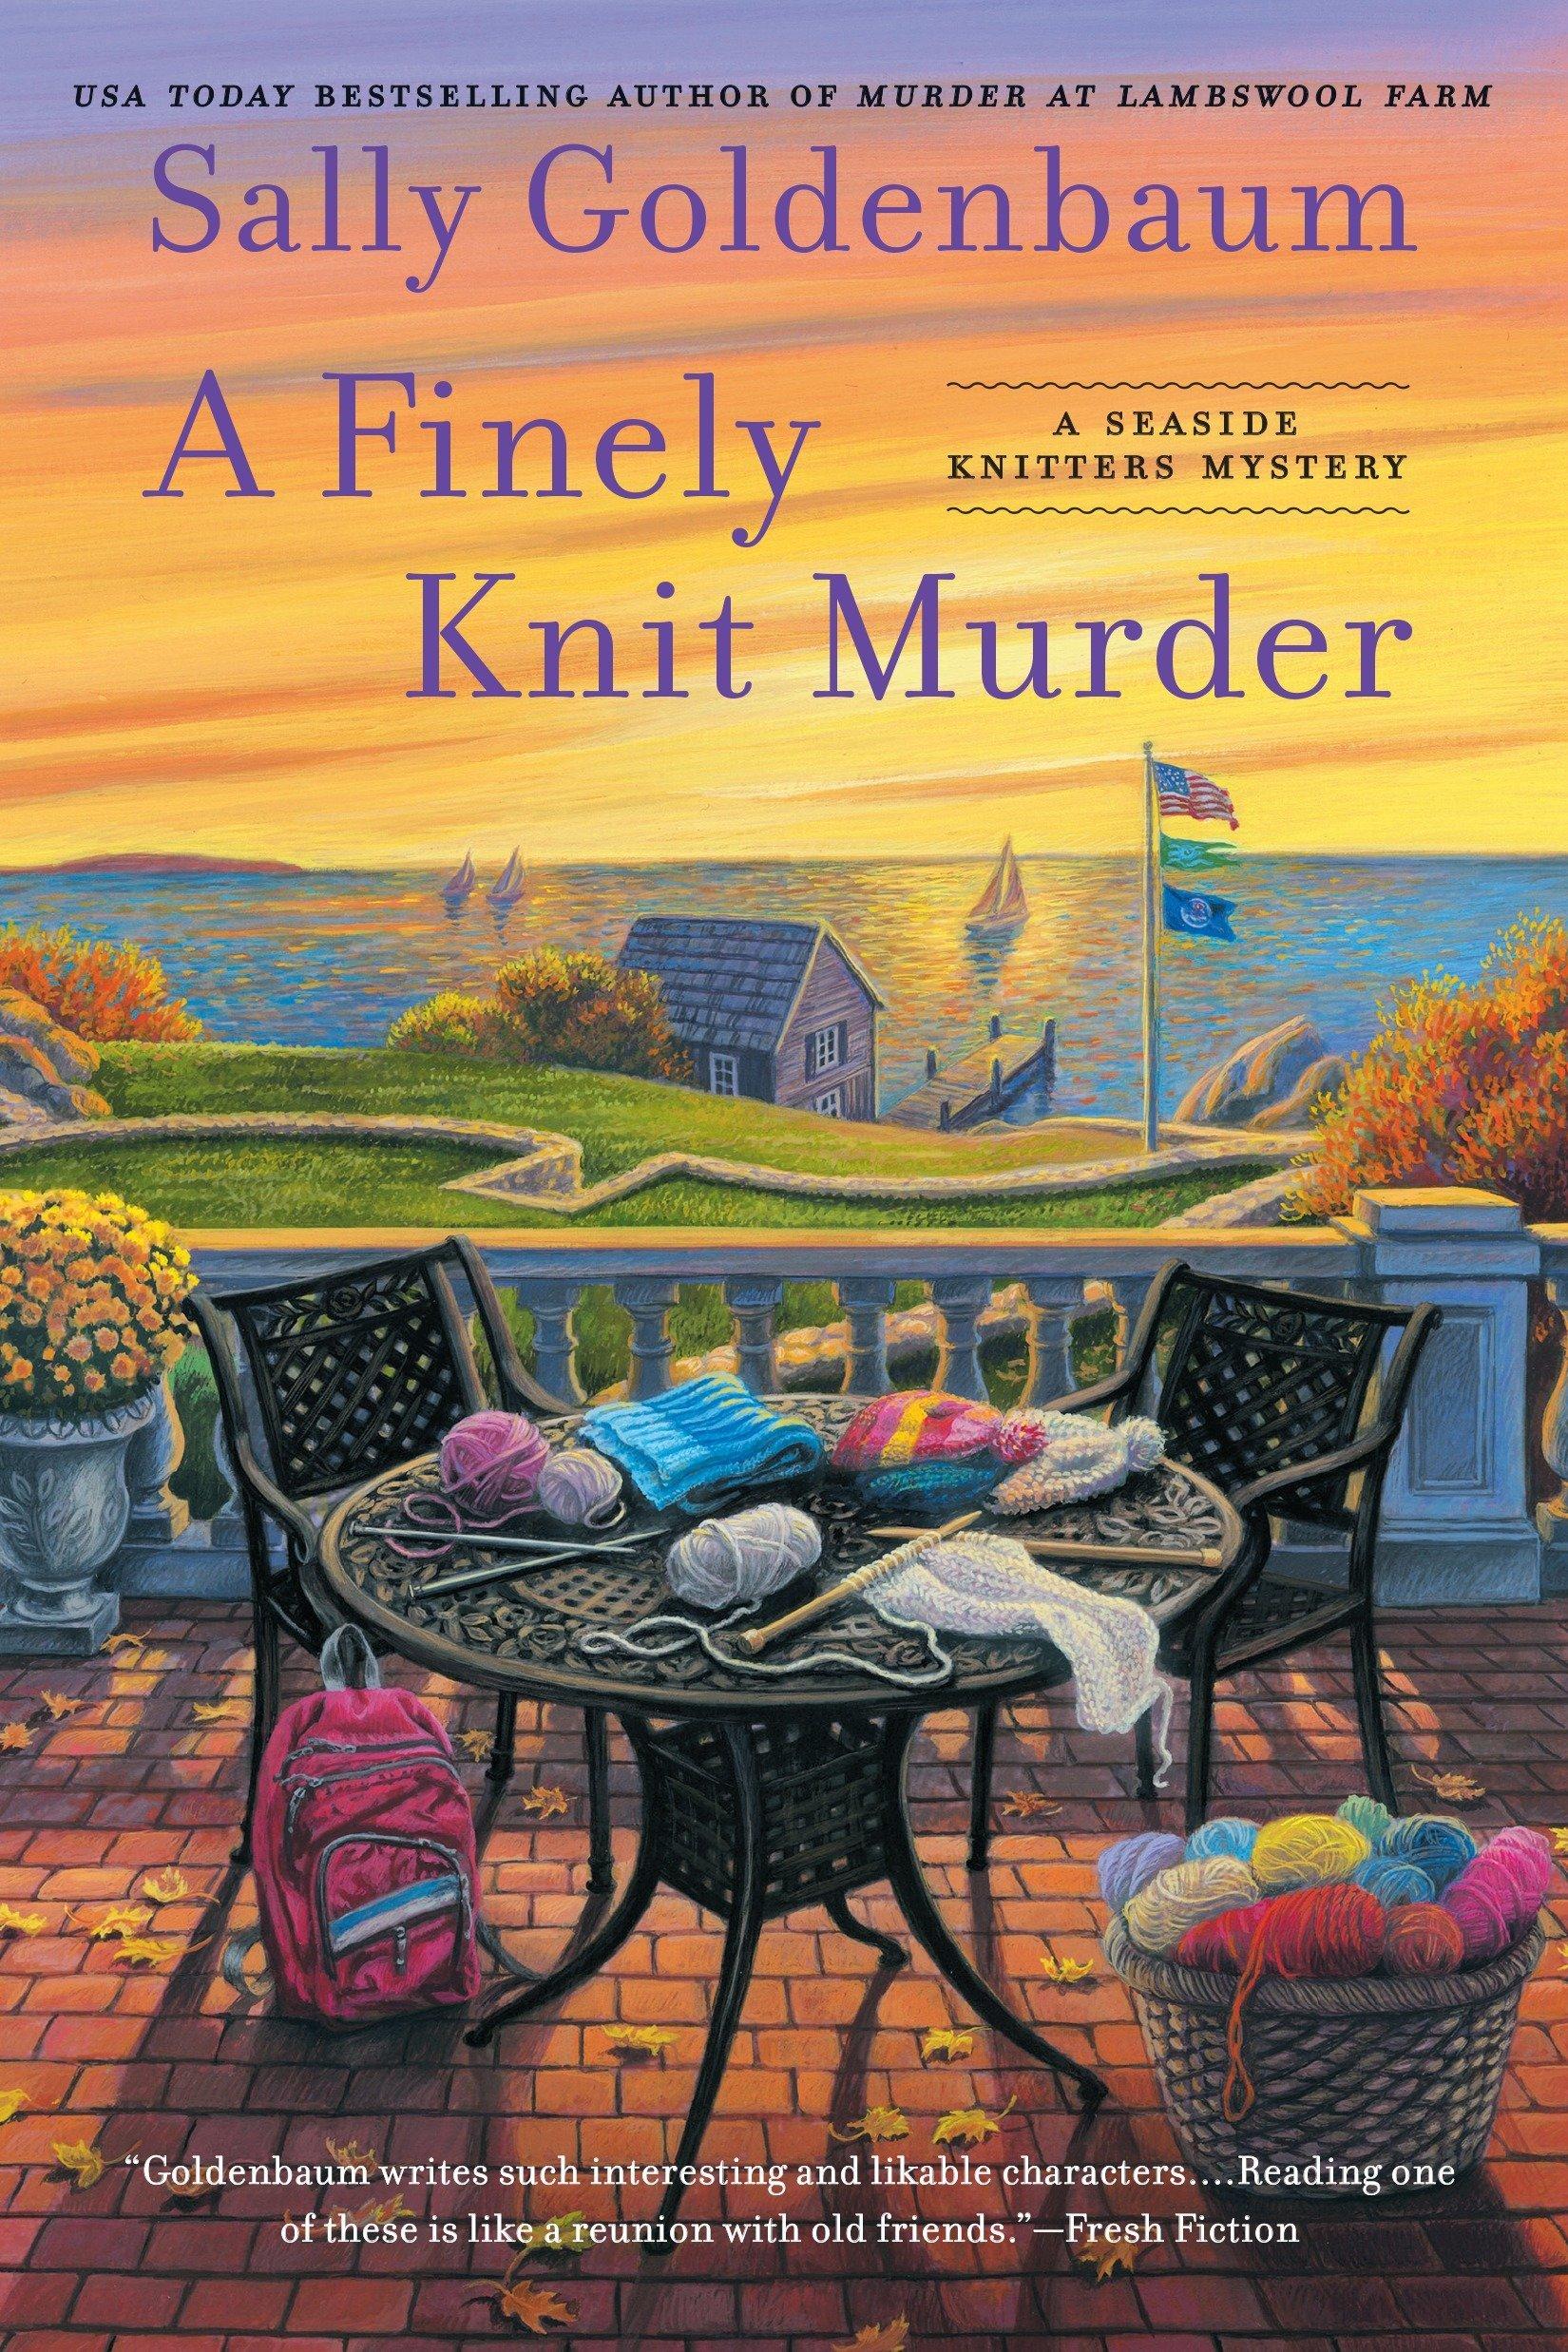 Amazon.com: A Finely Knit Murder (Seaside Knitters Mystery)  (9780451471611): Sally Goldenbaum: Books